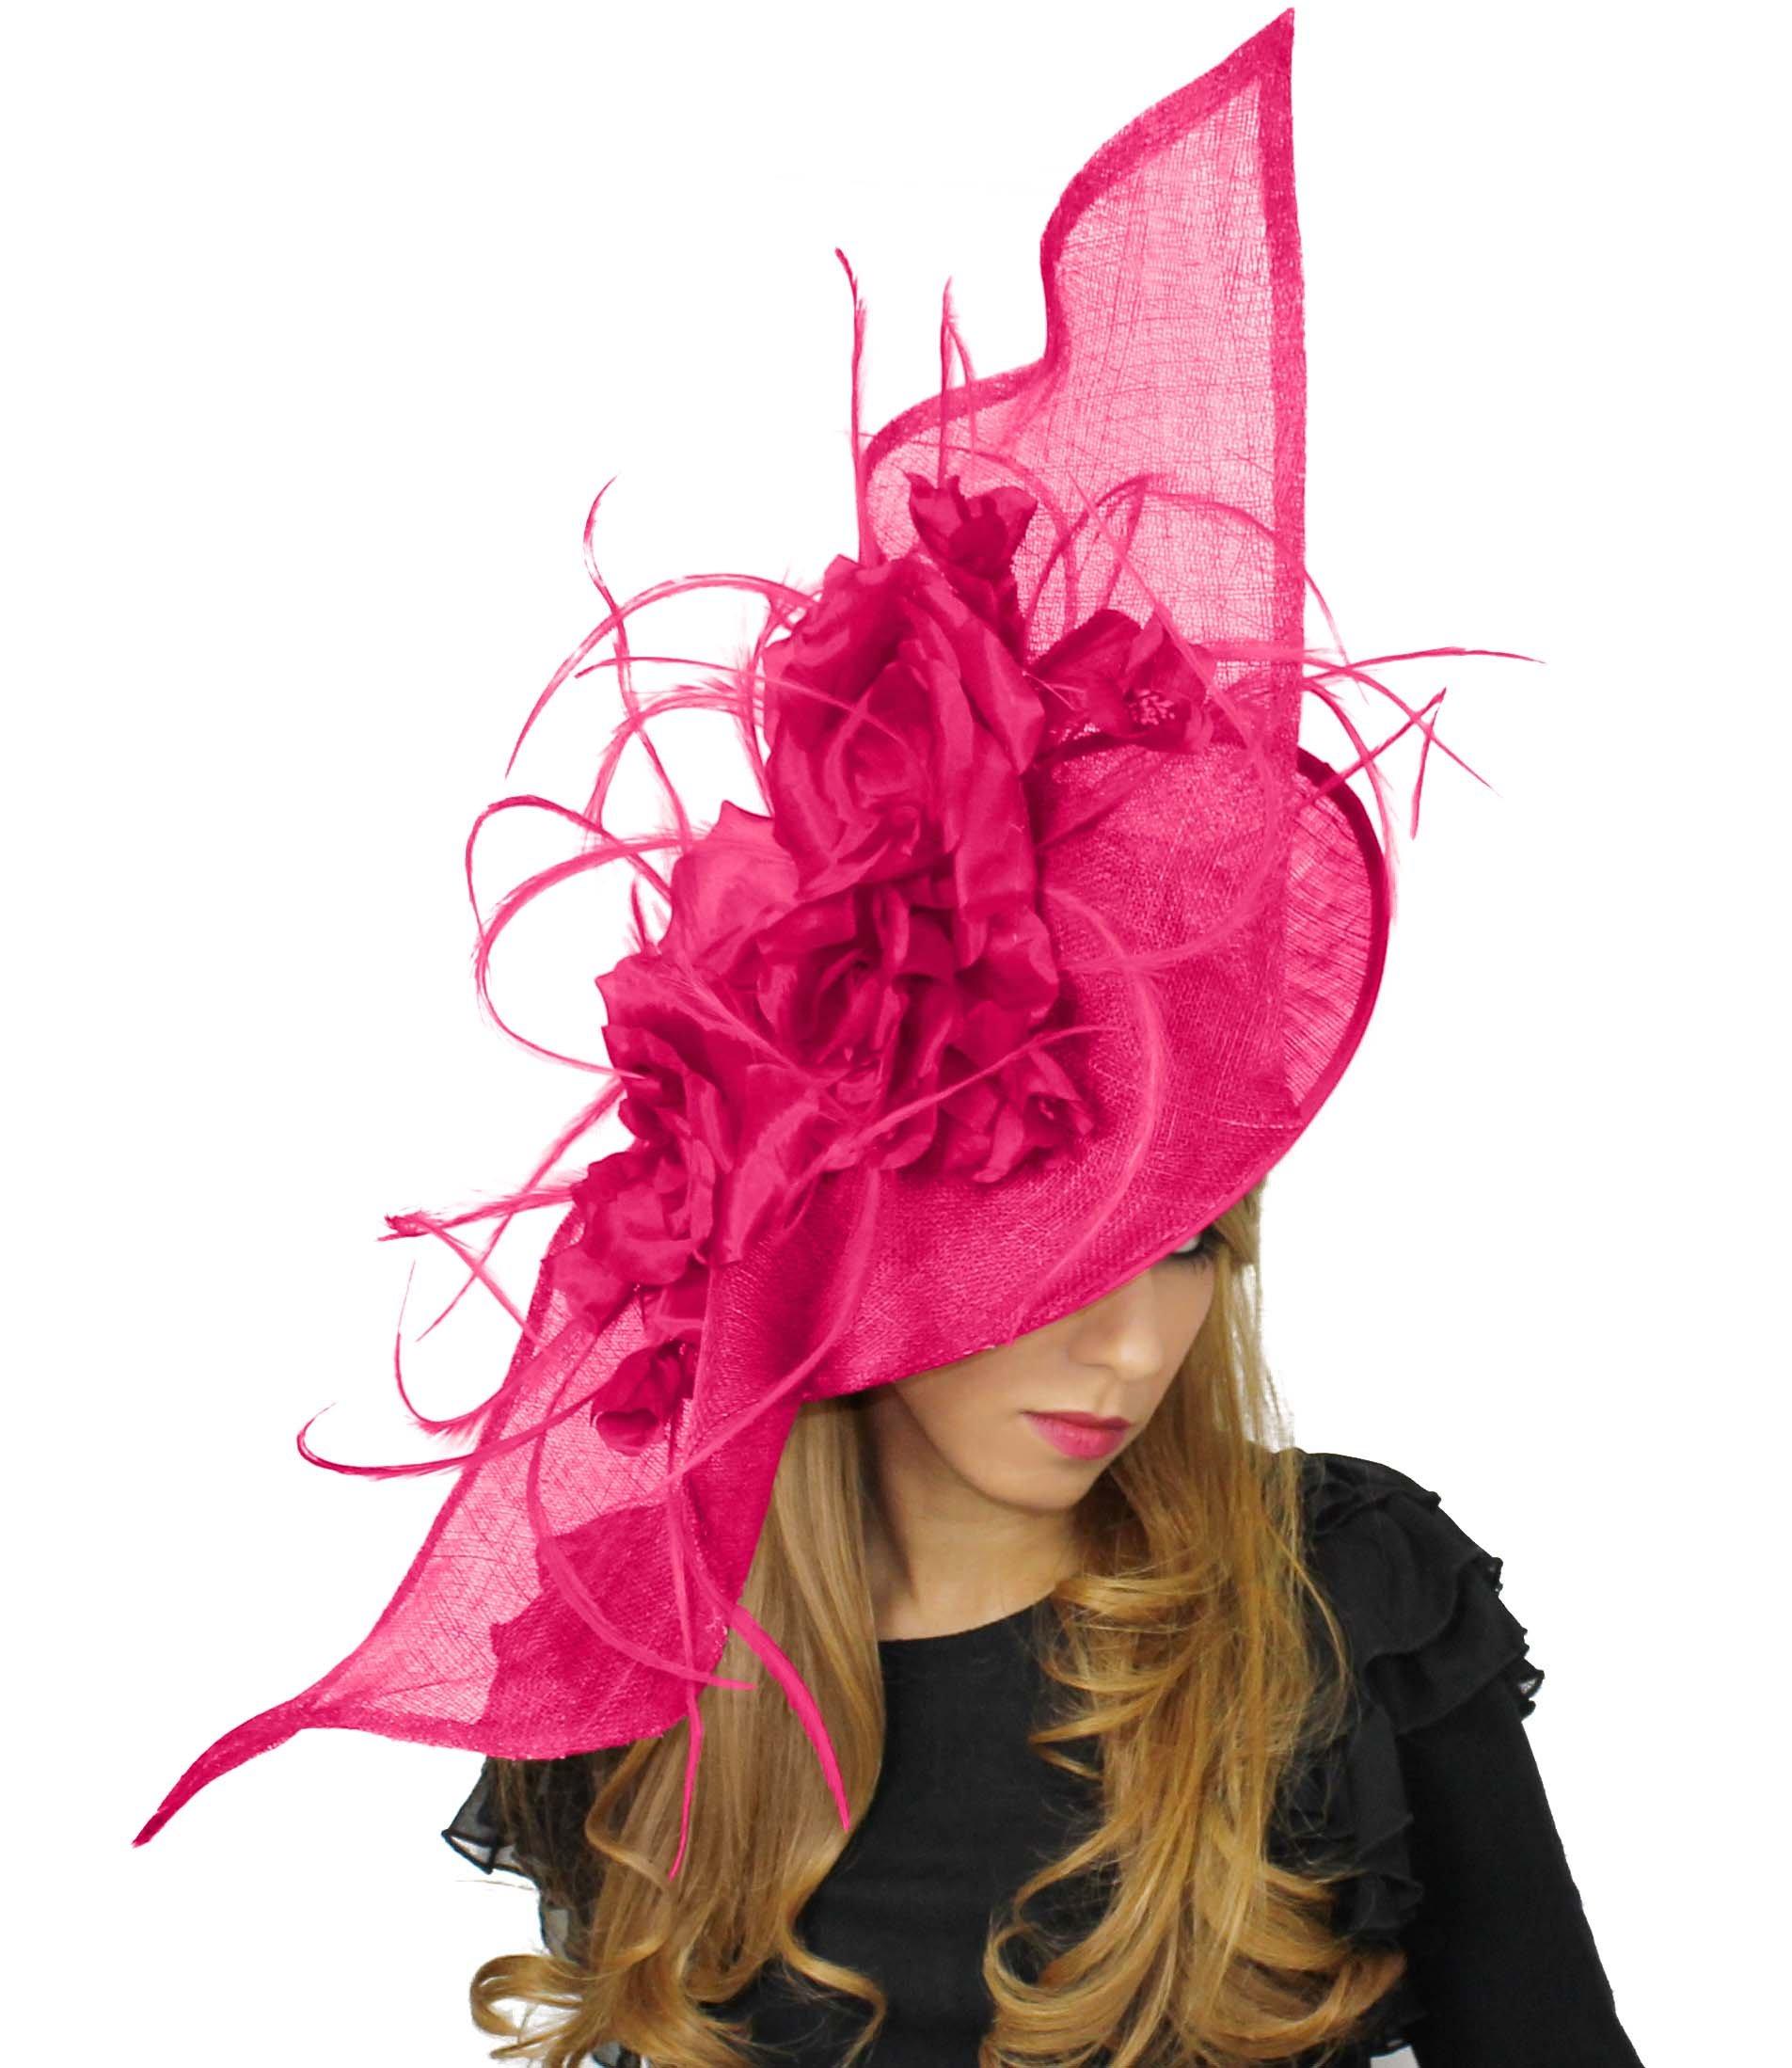 36 Inch Elisaveta Ascot Fascinator Hat With Headband - Fuchsia